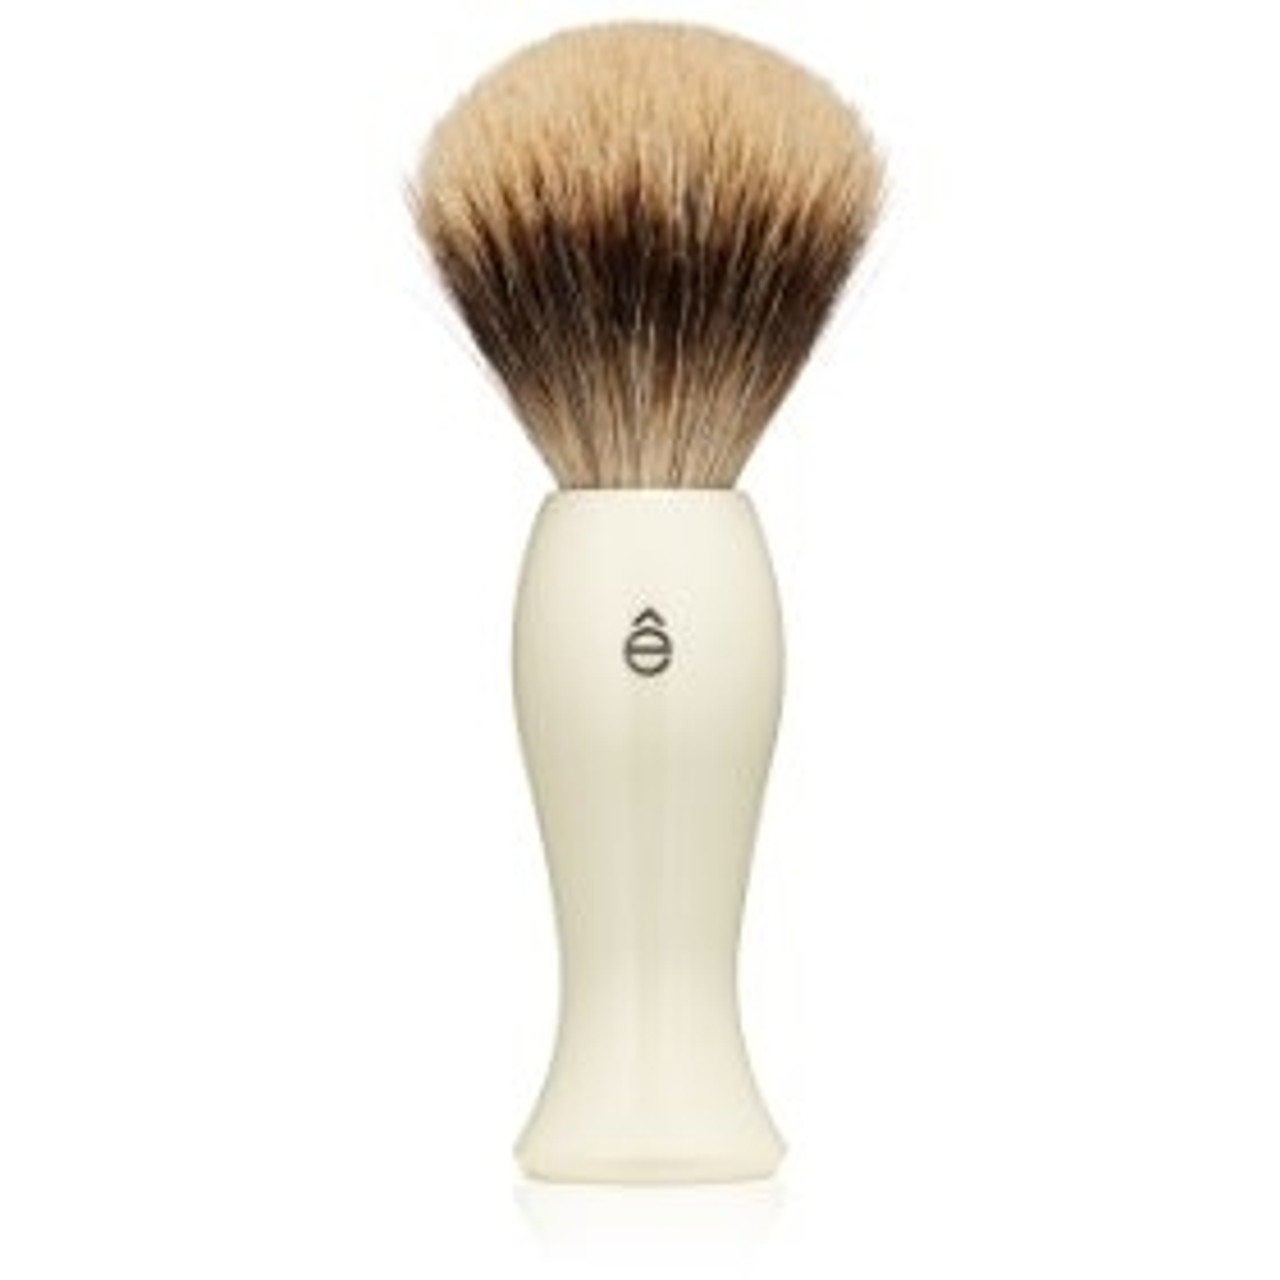 eShave Pure Badger Shaving Brush - Ivory